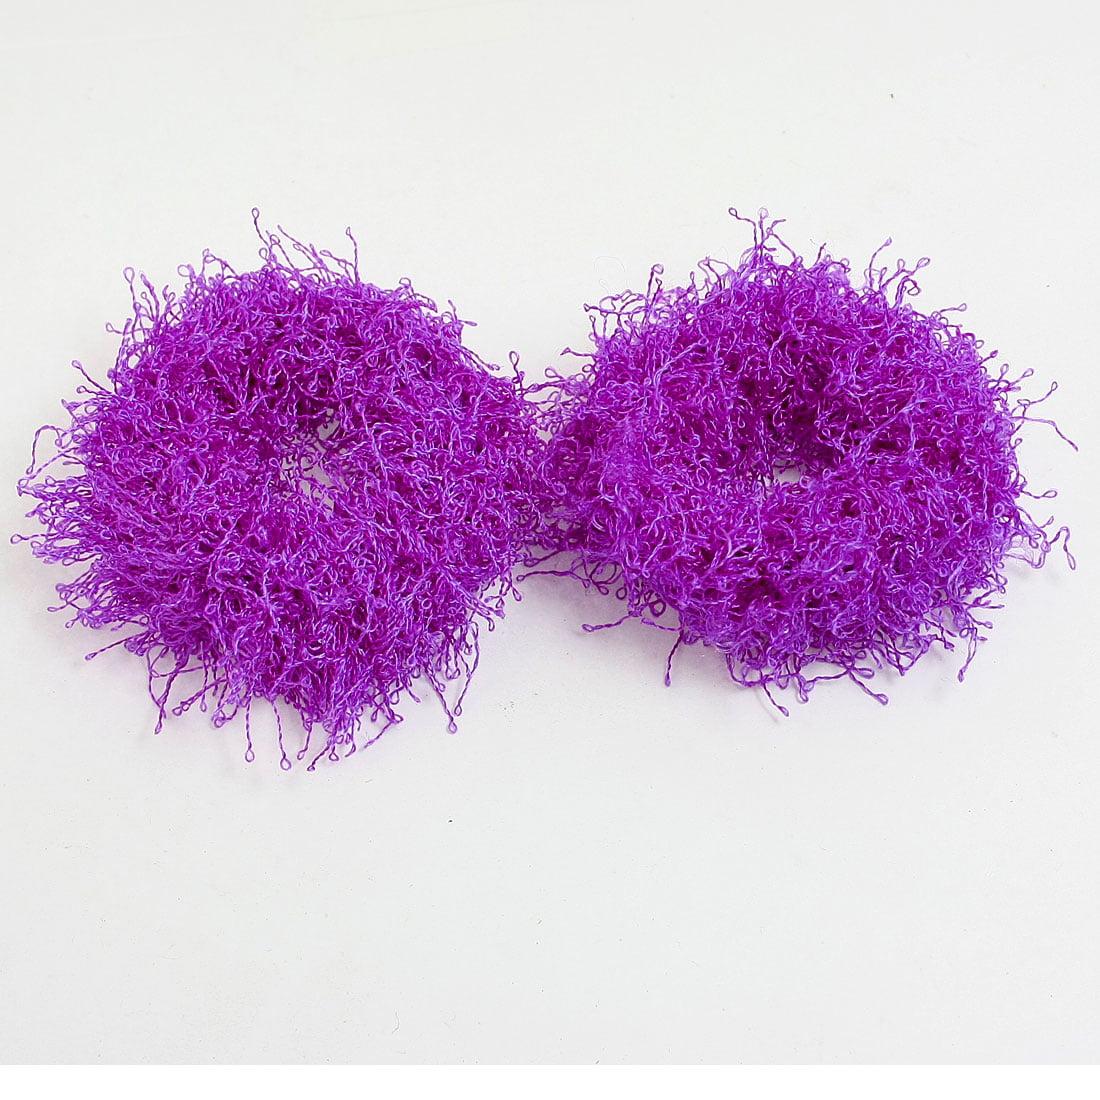 Unique Bargains 2 Pcs Stretchy Hair Accessories Solid Color Scrunchies Ponytail Holder